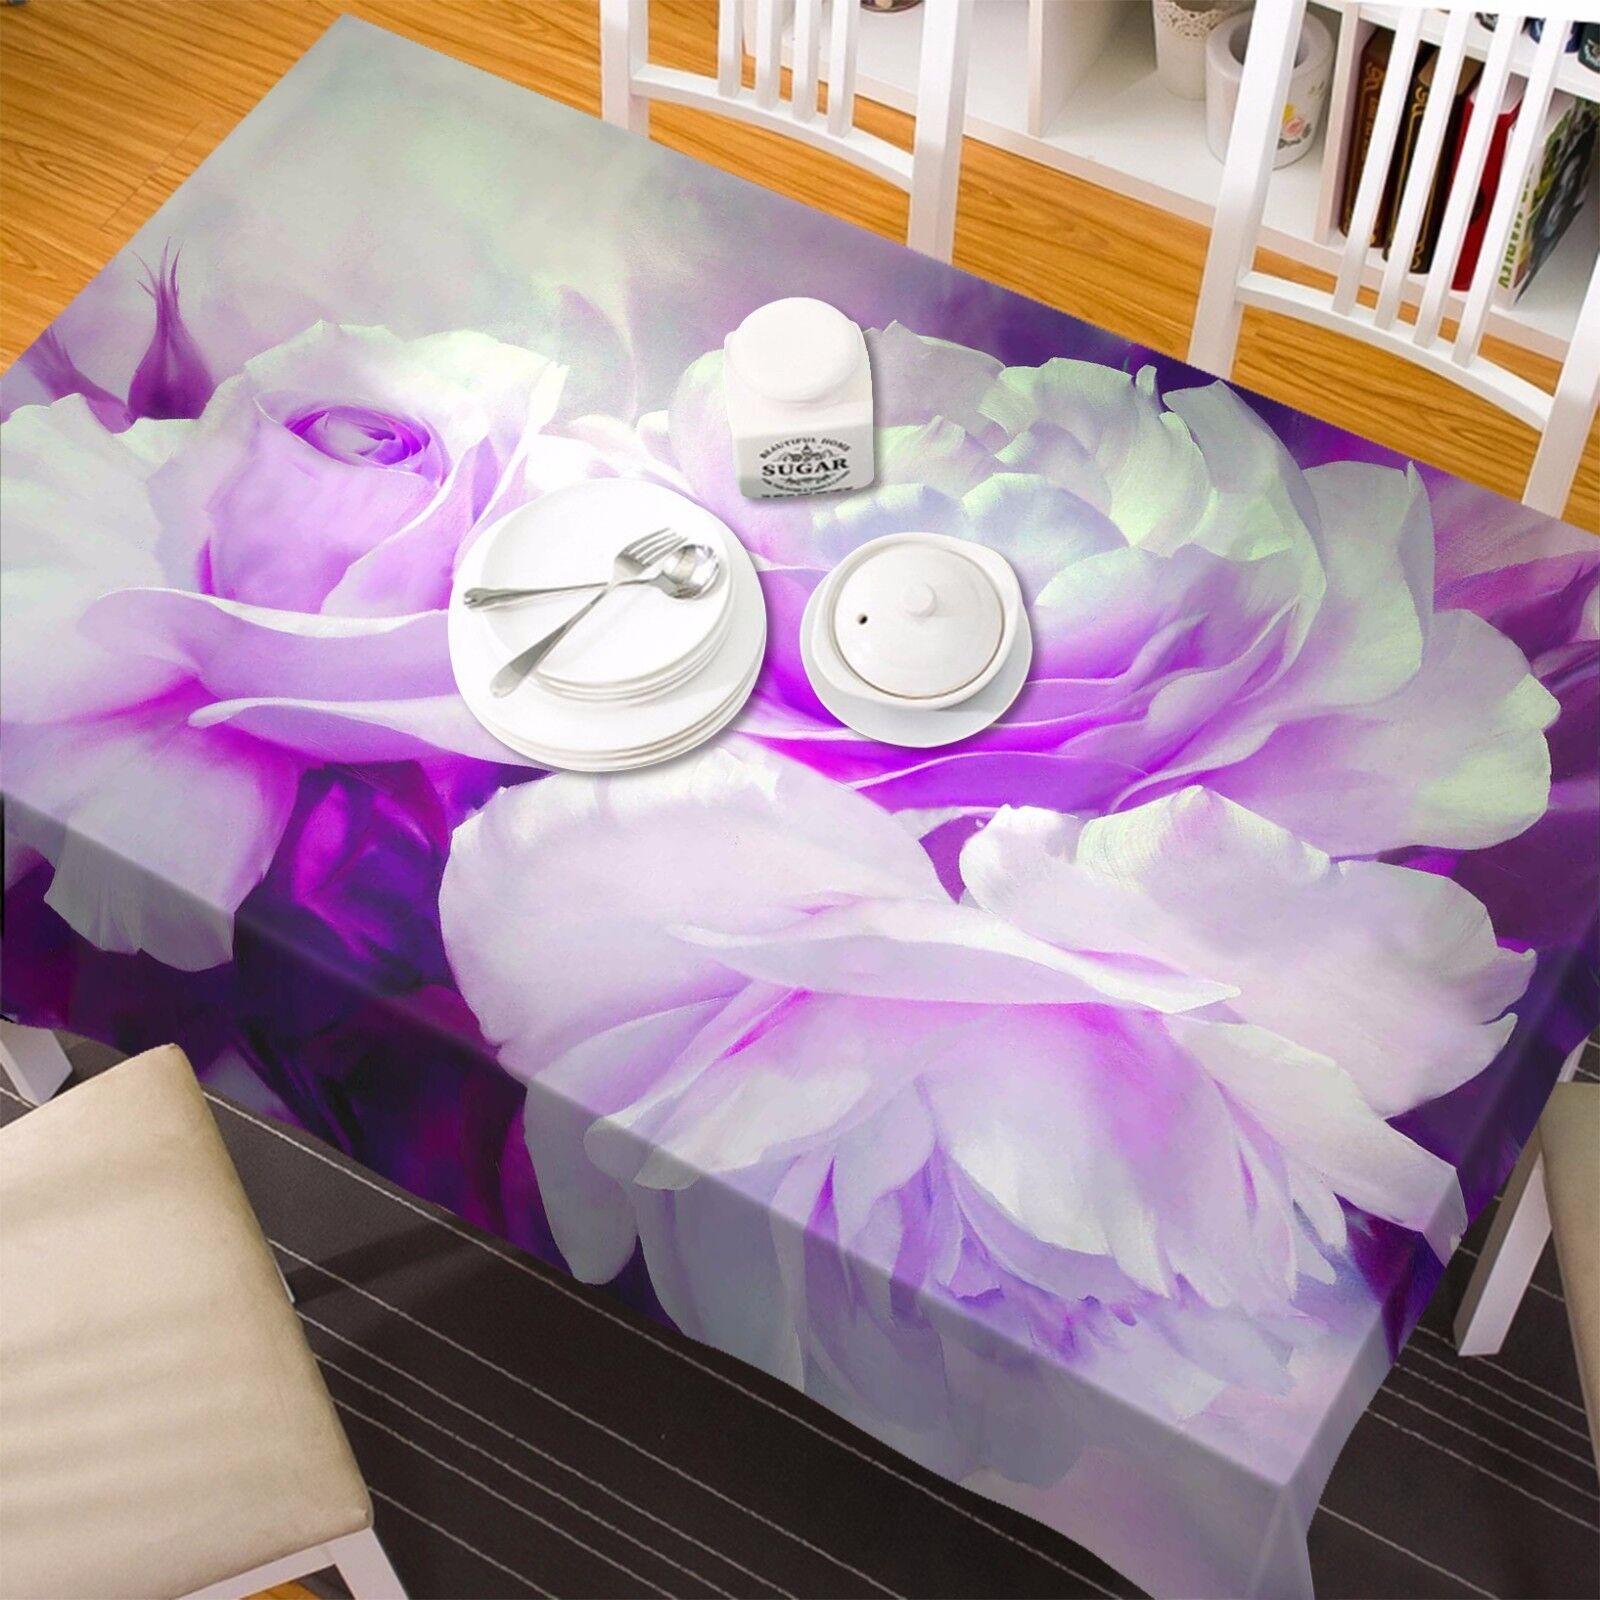 3D Petals Tablecloth Table Cover Cloth Birthday Party AJ WALLPAPER UK Lemon